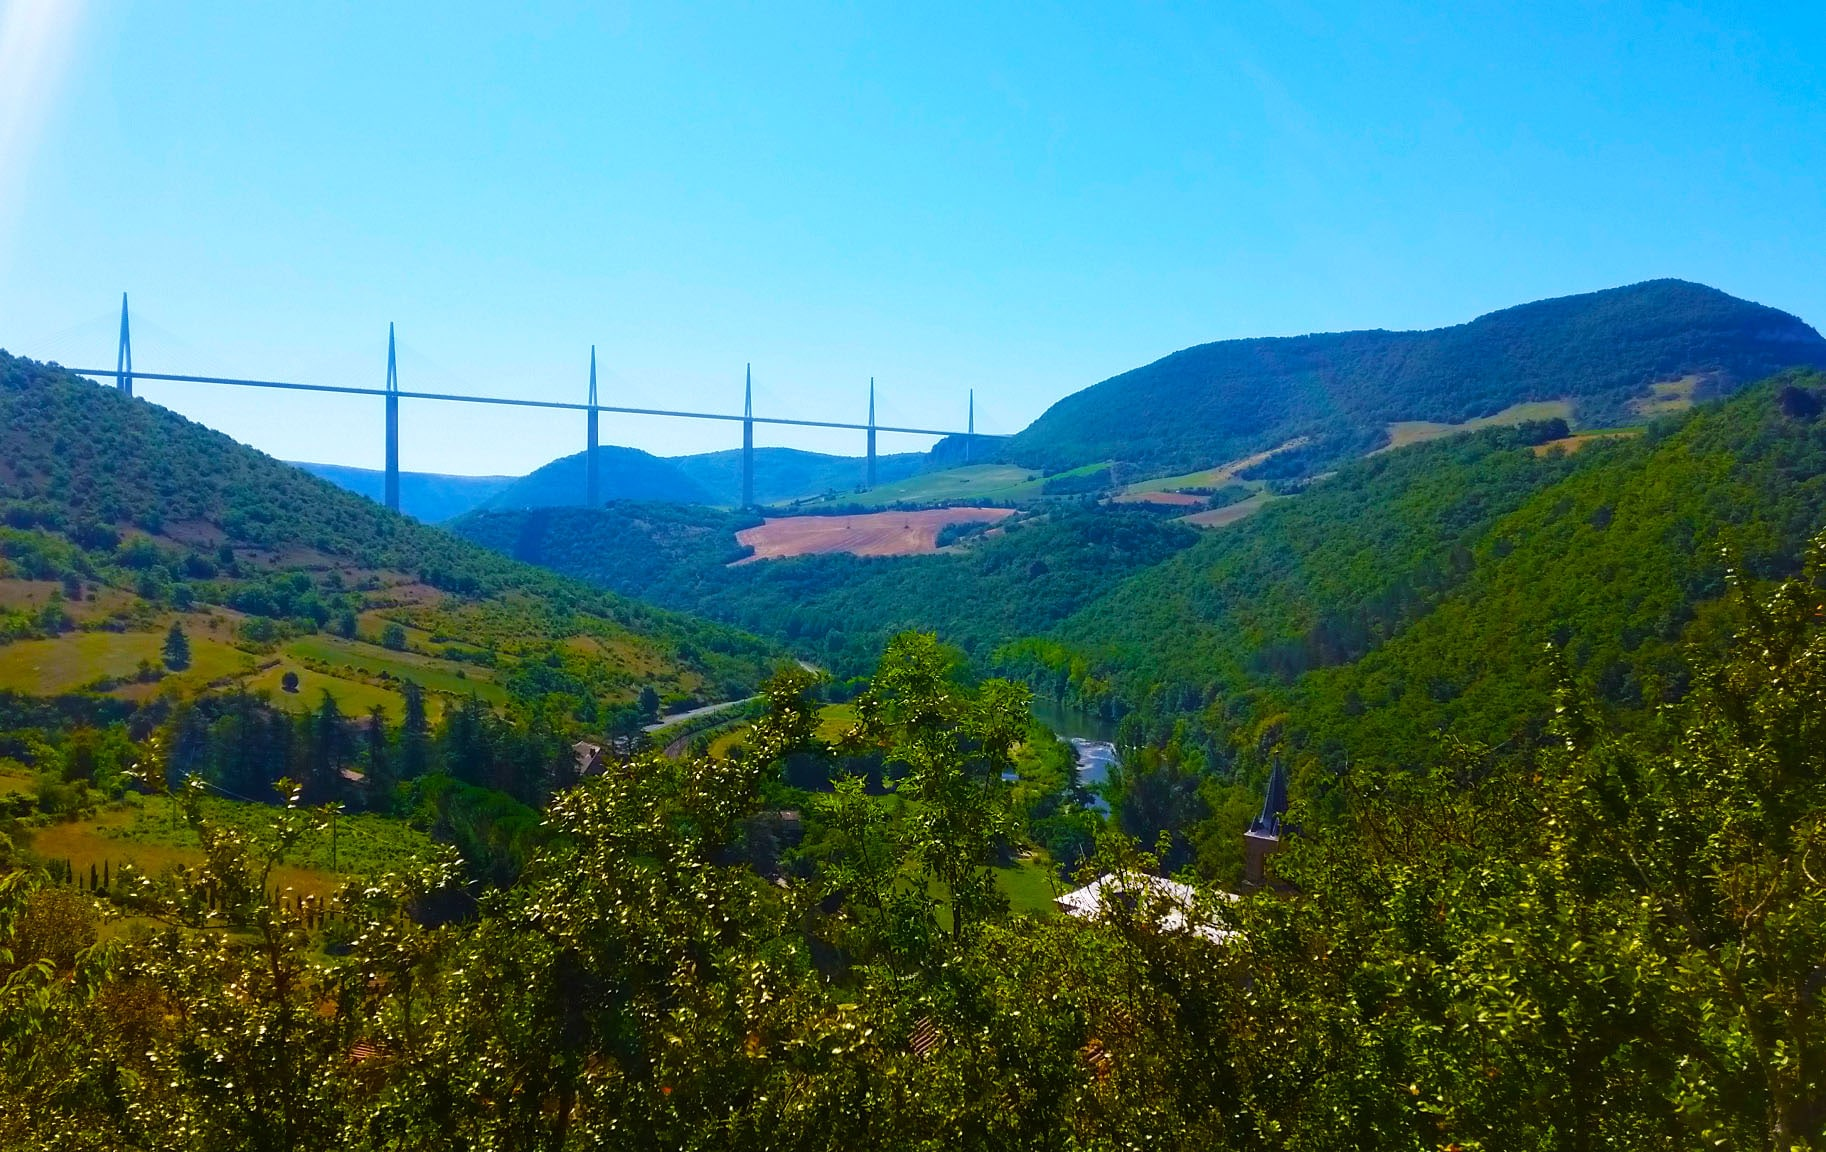 Le viaduc de Millau, Aveyron